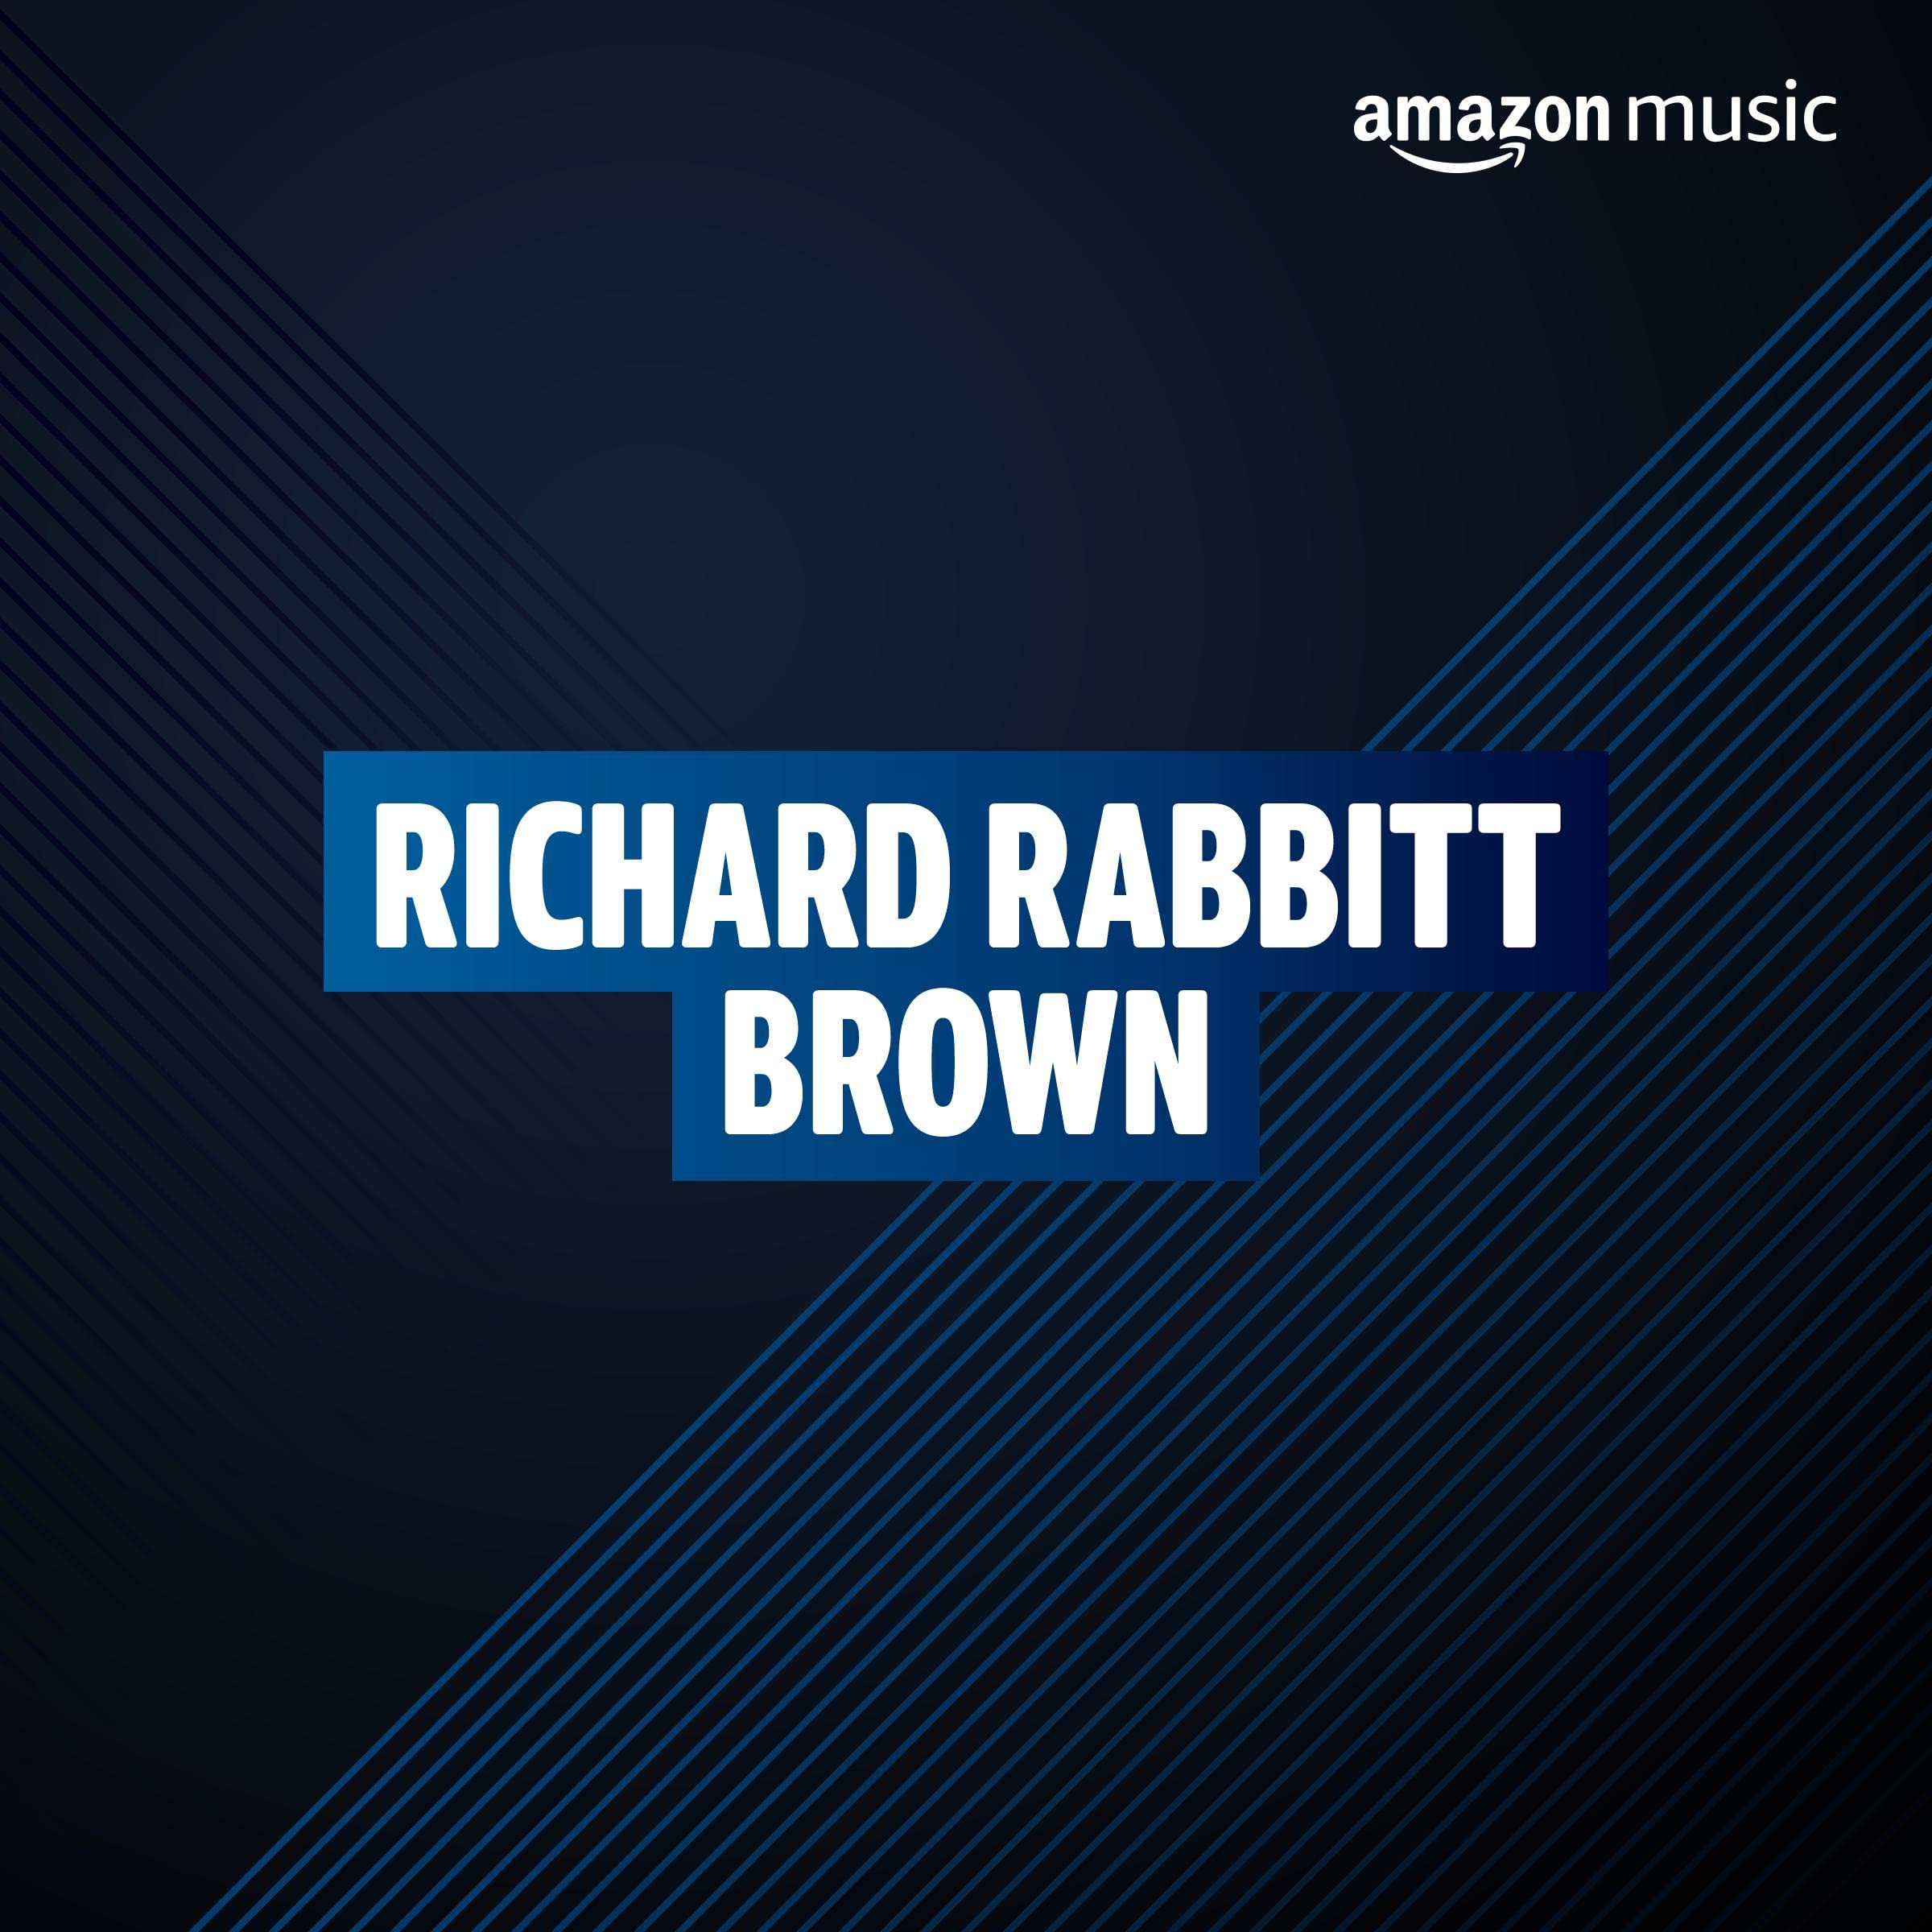 Richard Rabbitt Brown